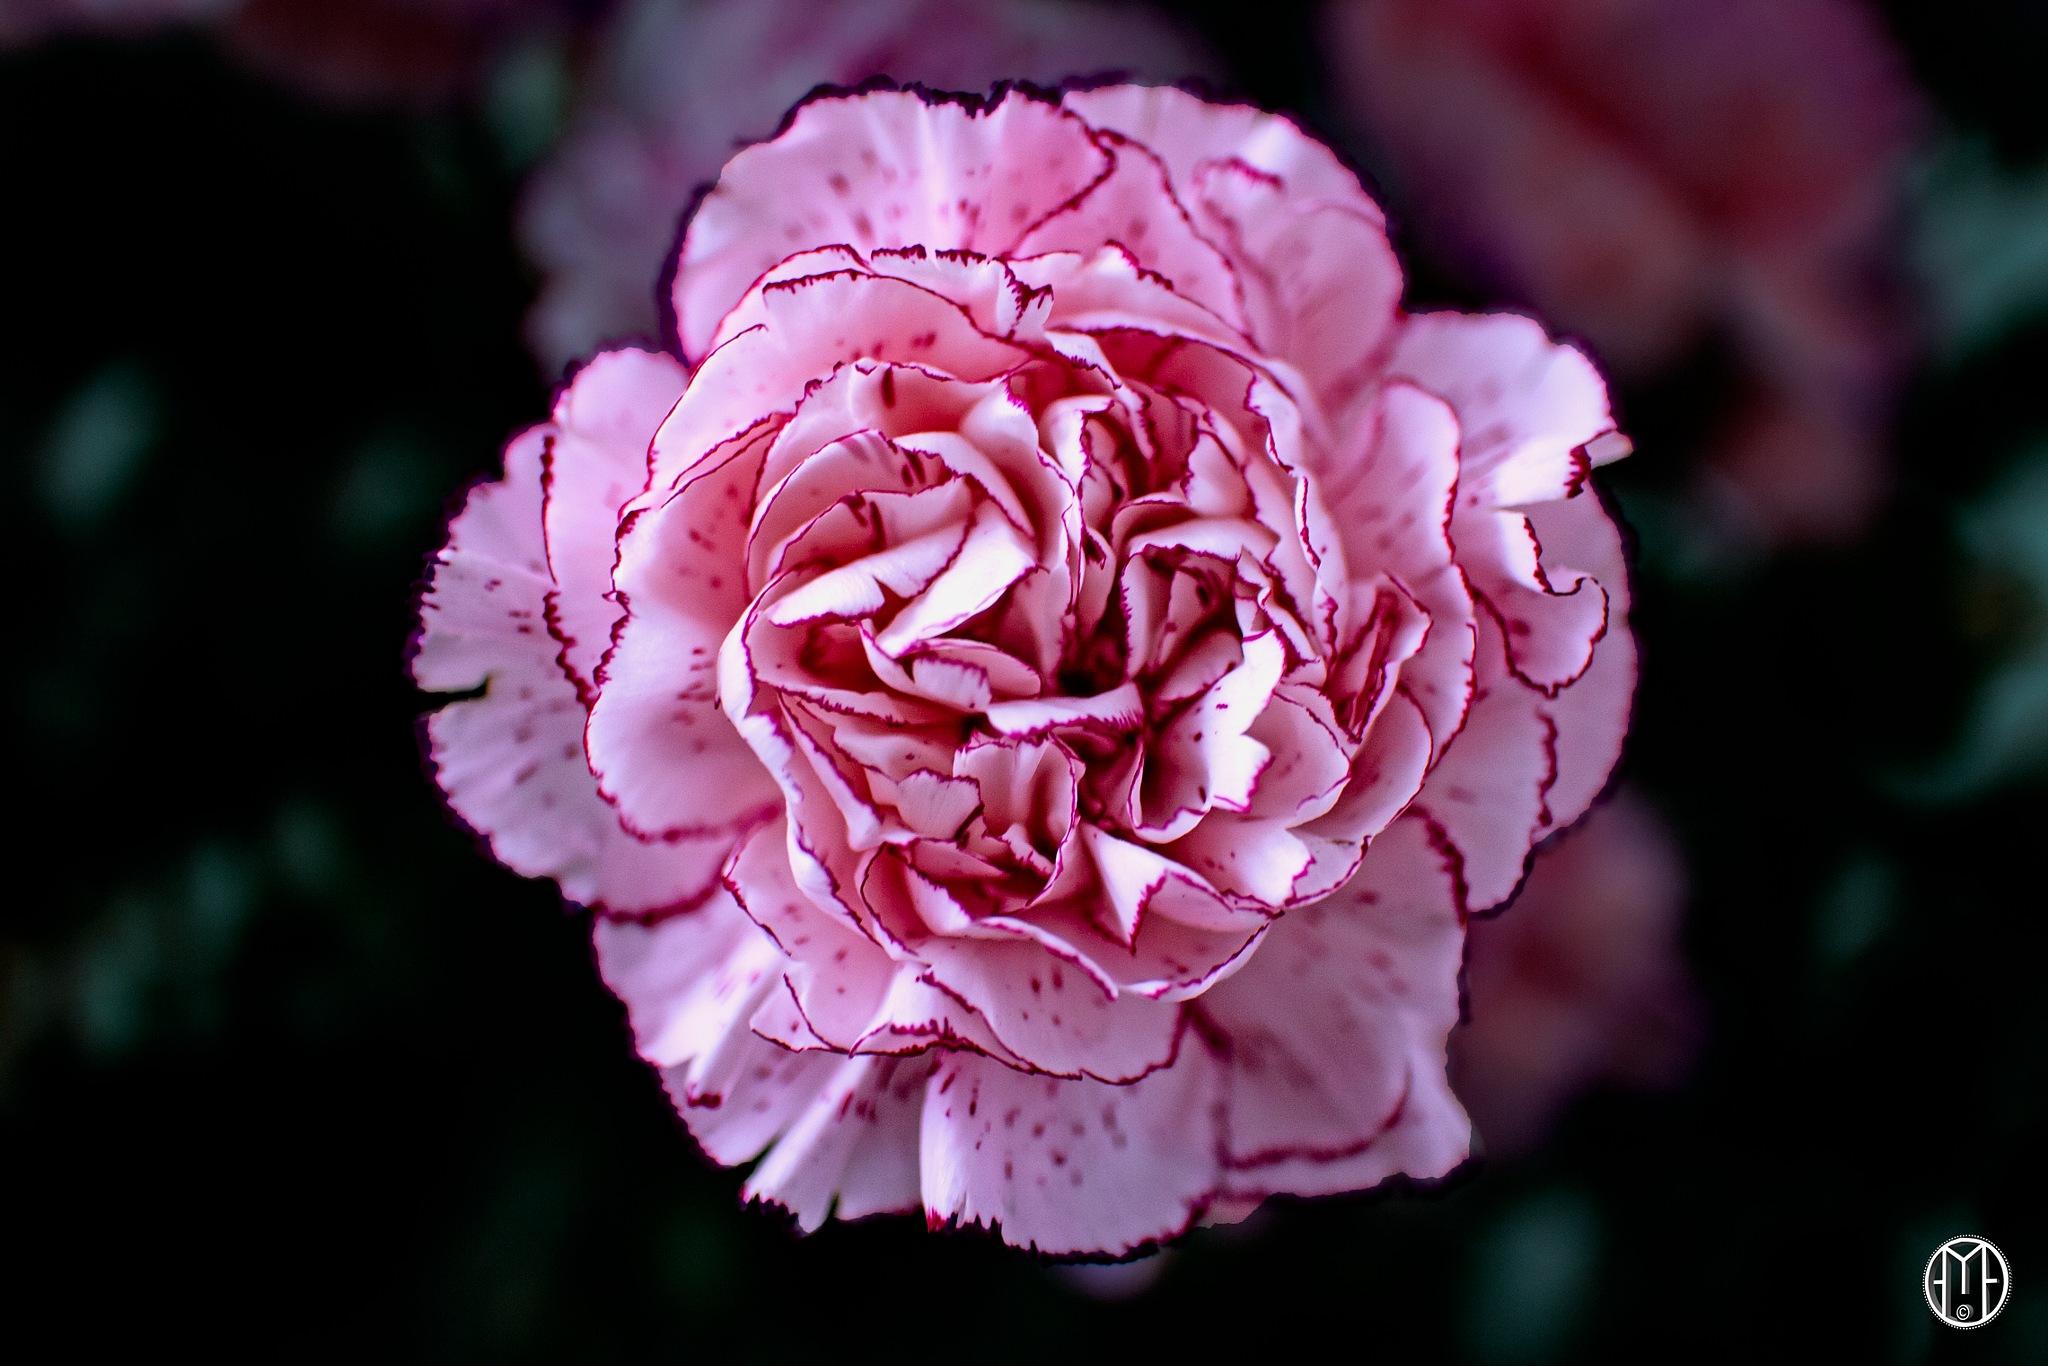 Carnation by Gabriel Ochoa Rojas